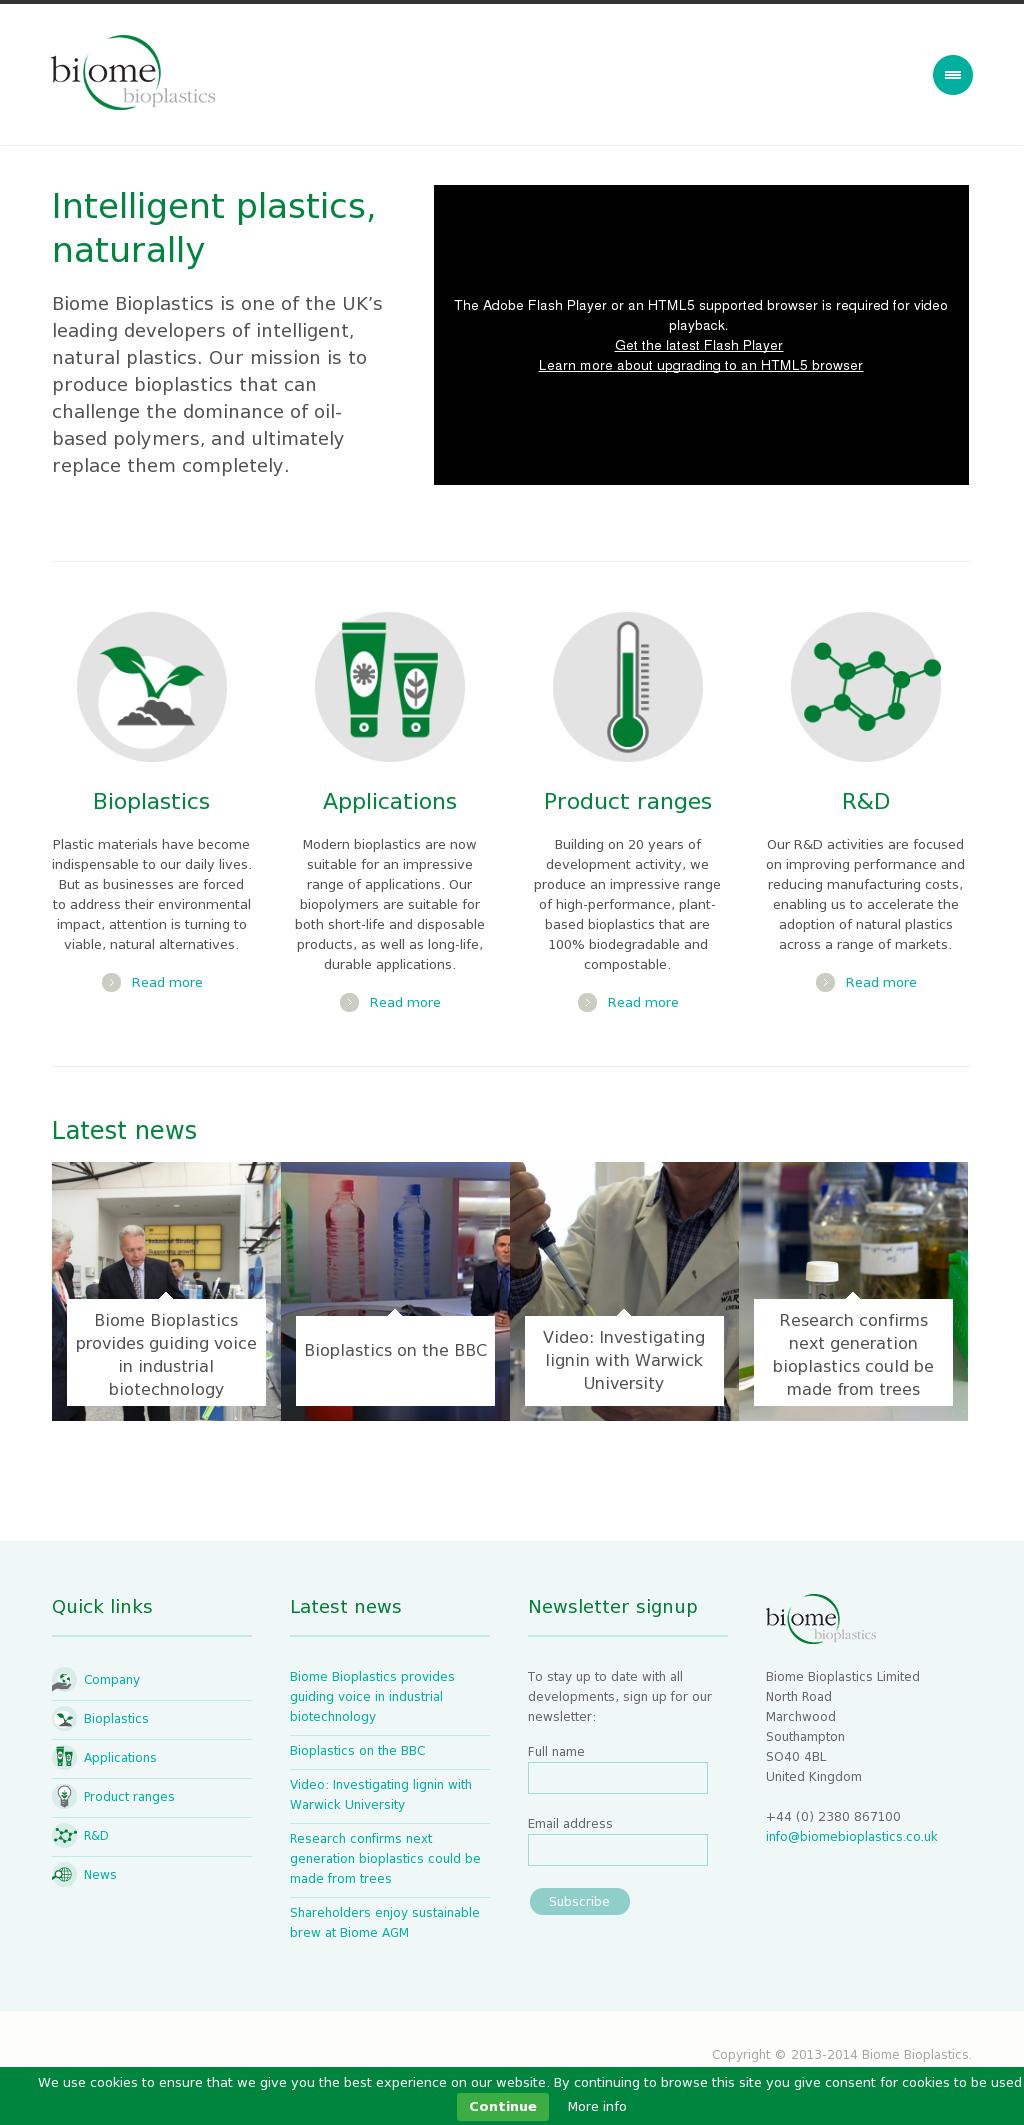 Biome Bioplastics Competitors, Revenue and Employees - Owler Company